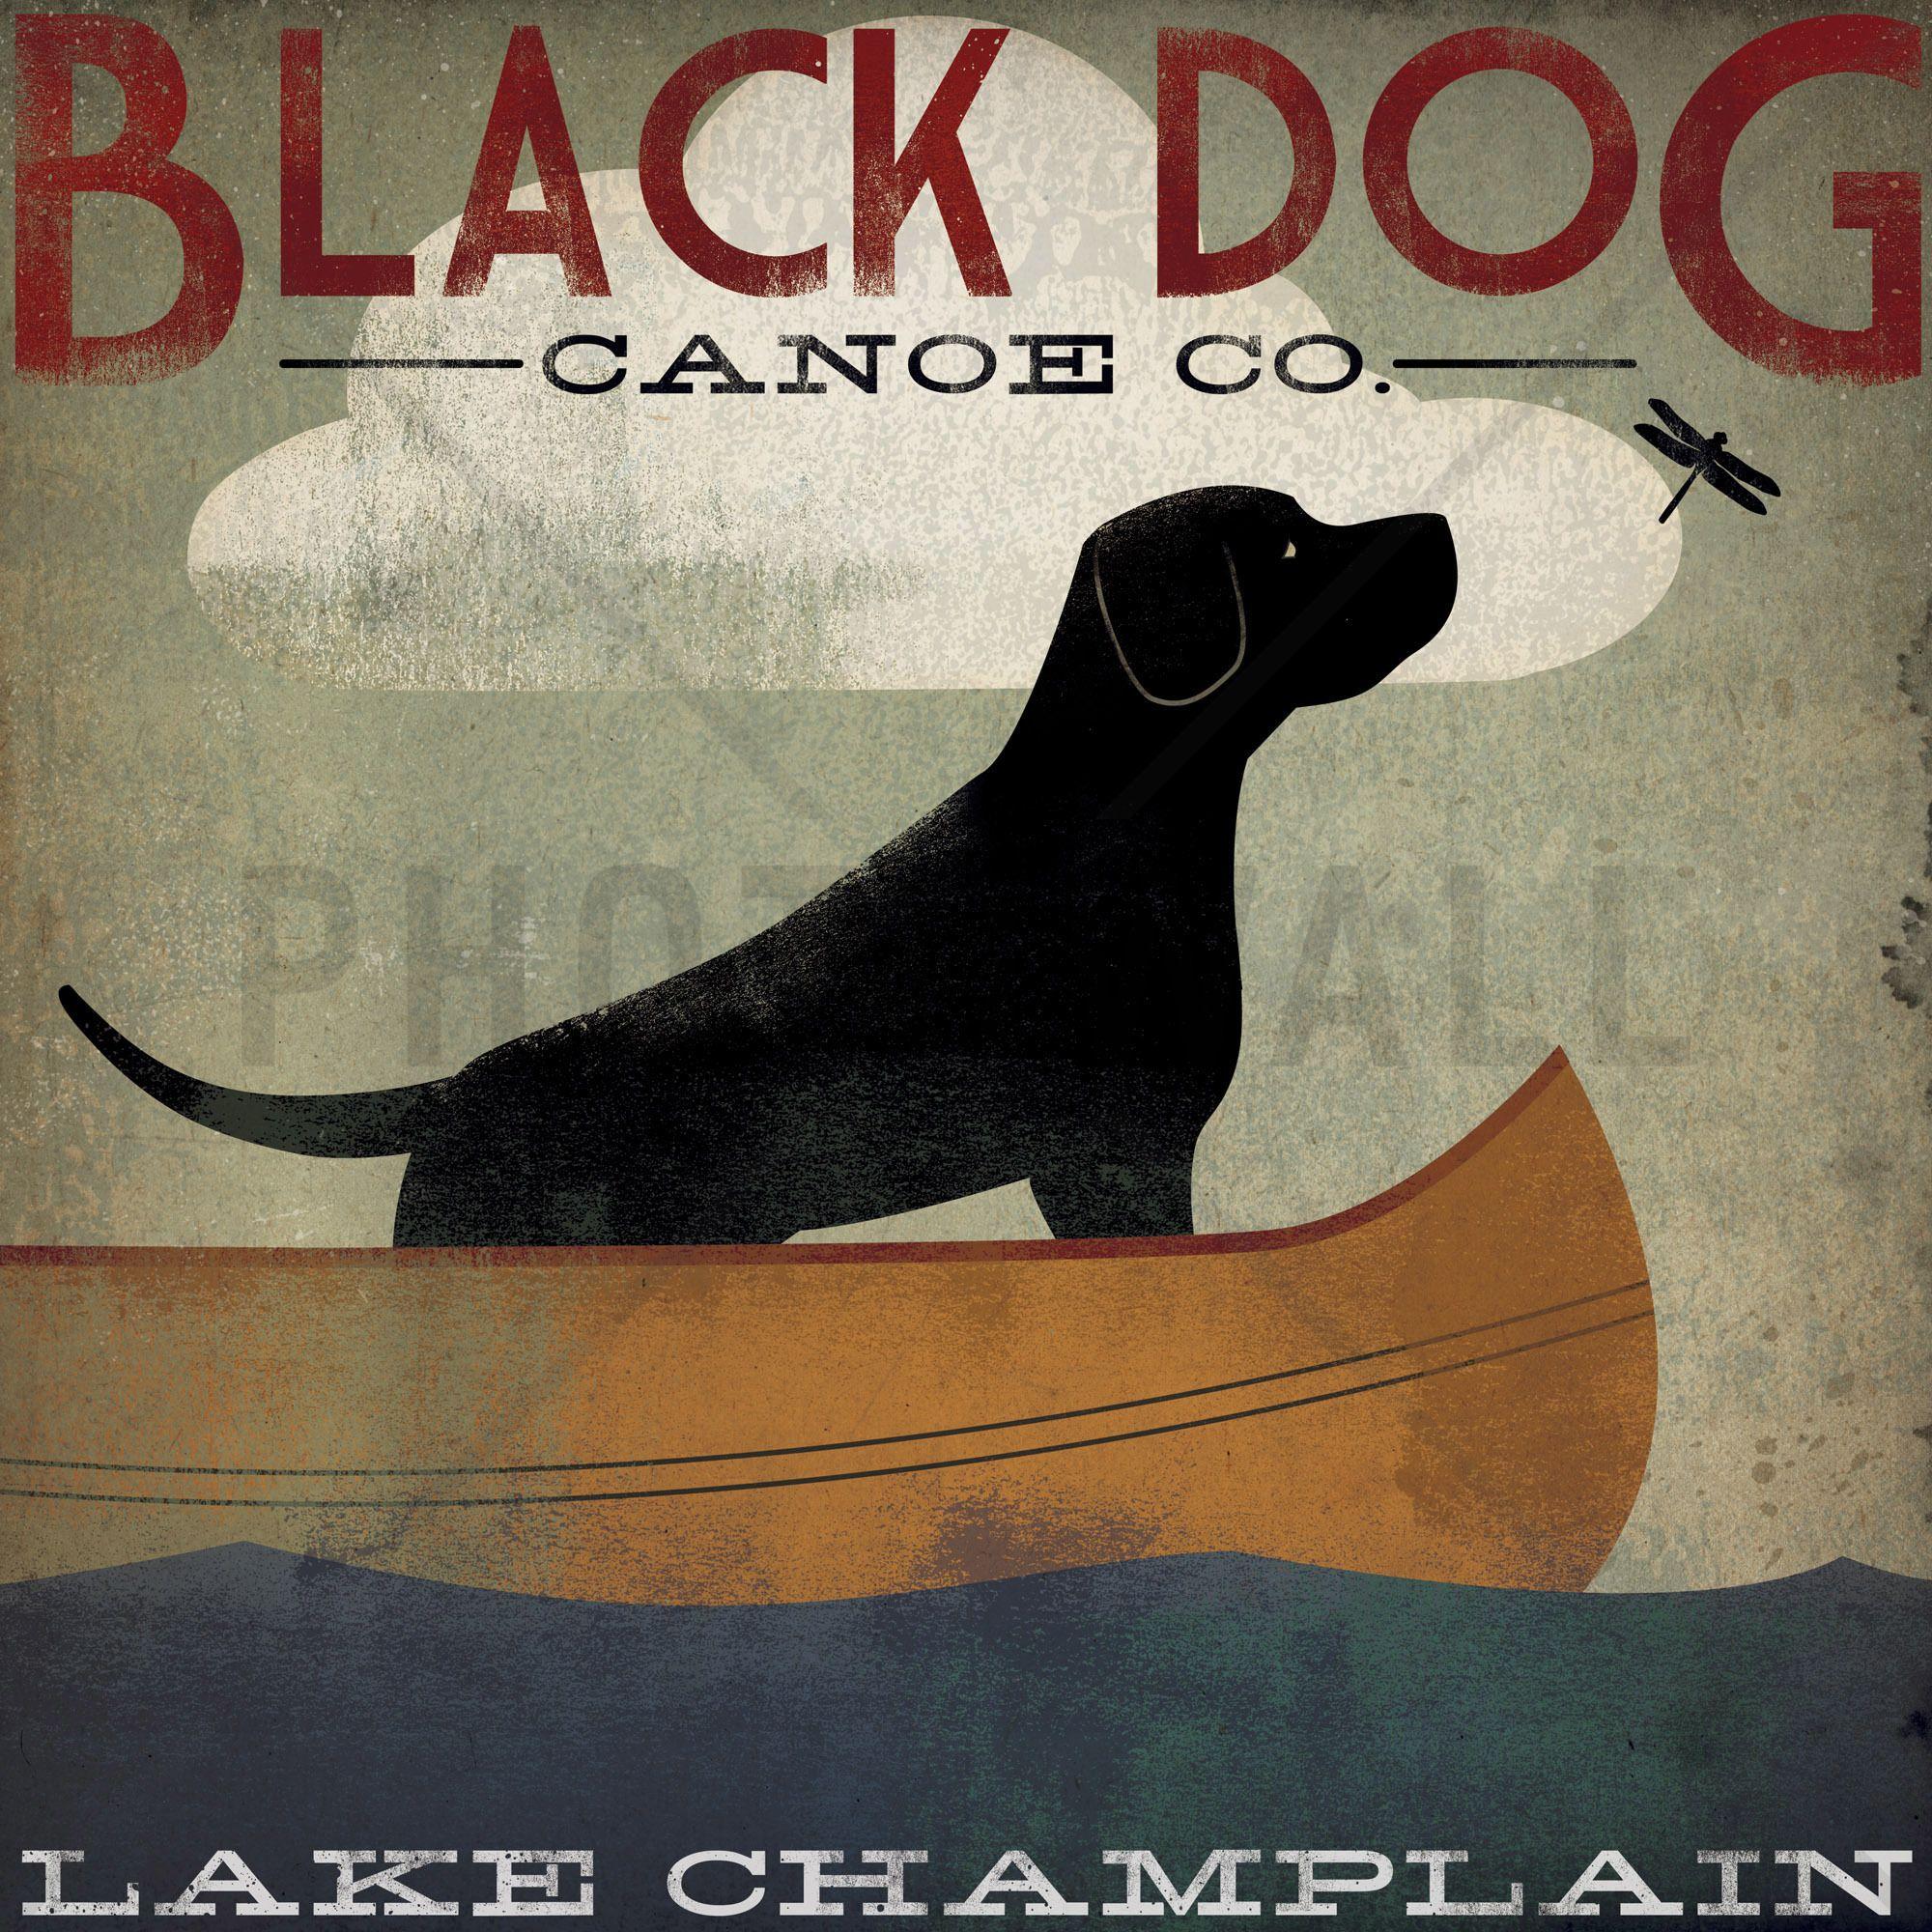 Black Dog Lake Champlain - Canvas-taulut (maalaus) - Photowall